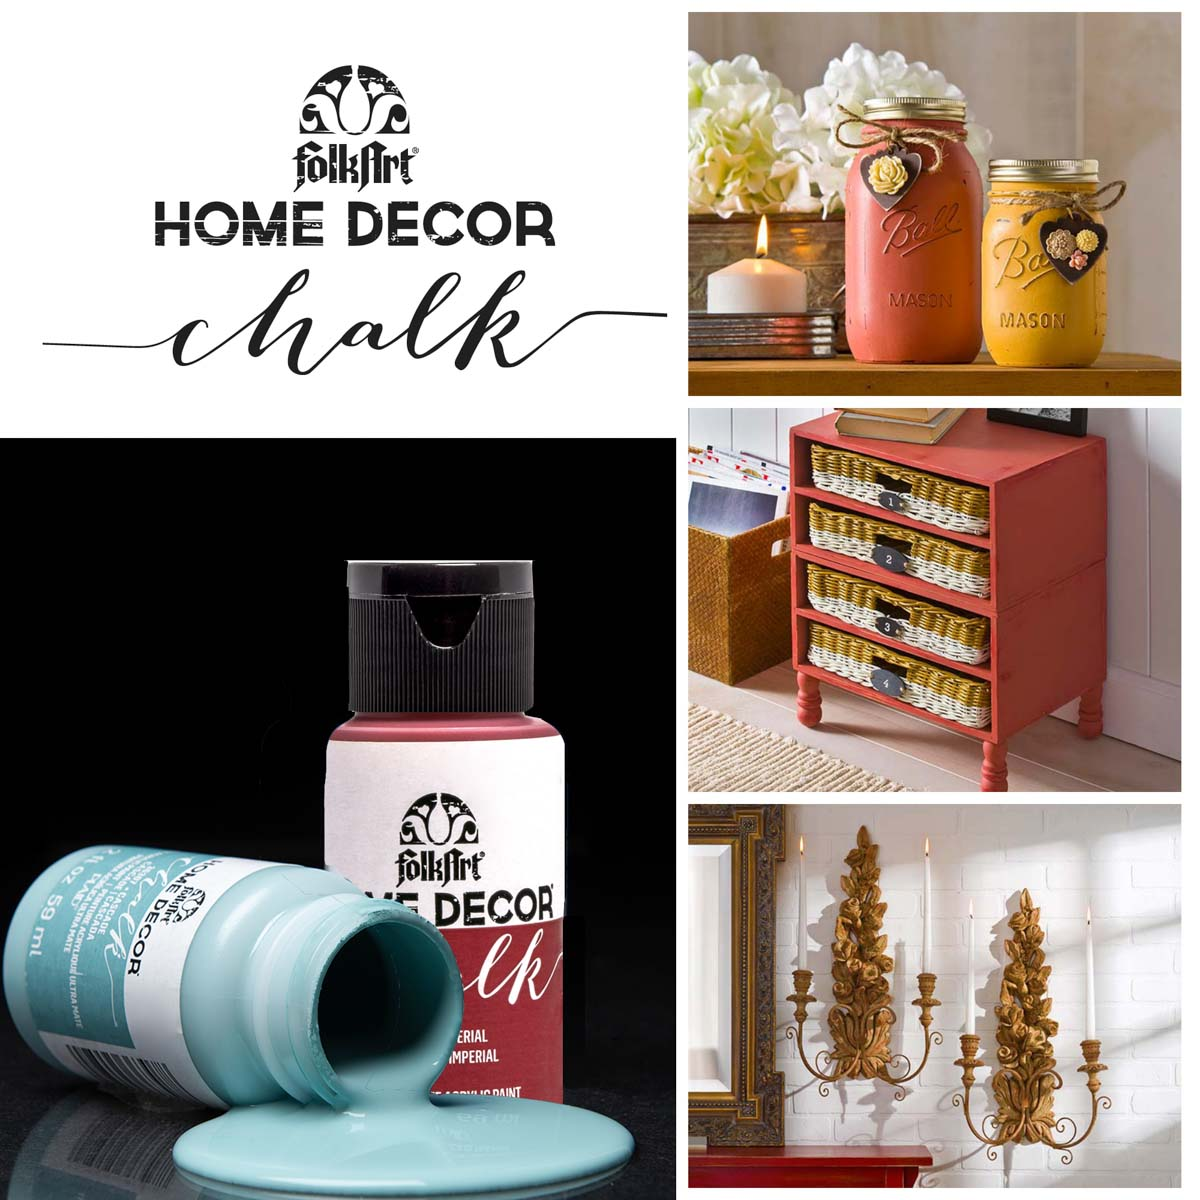 FolkArt Home Decor Chalk - Antique Green, 2 oz. - 36210